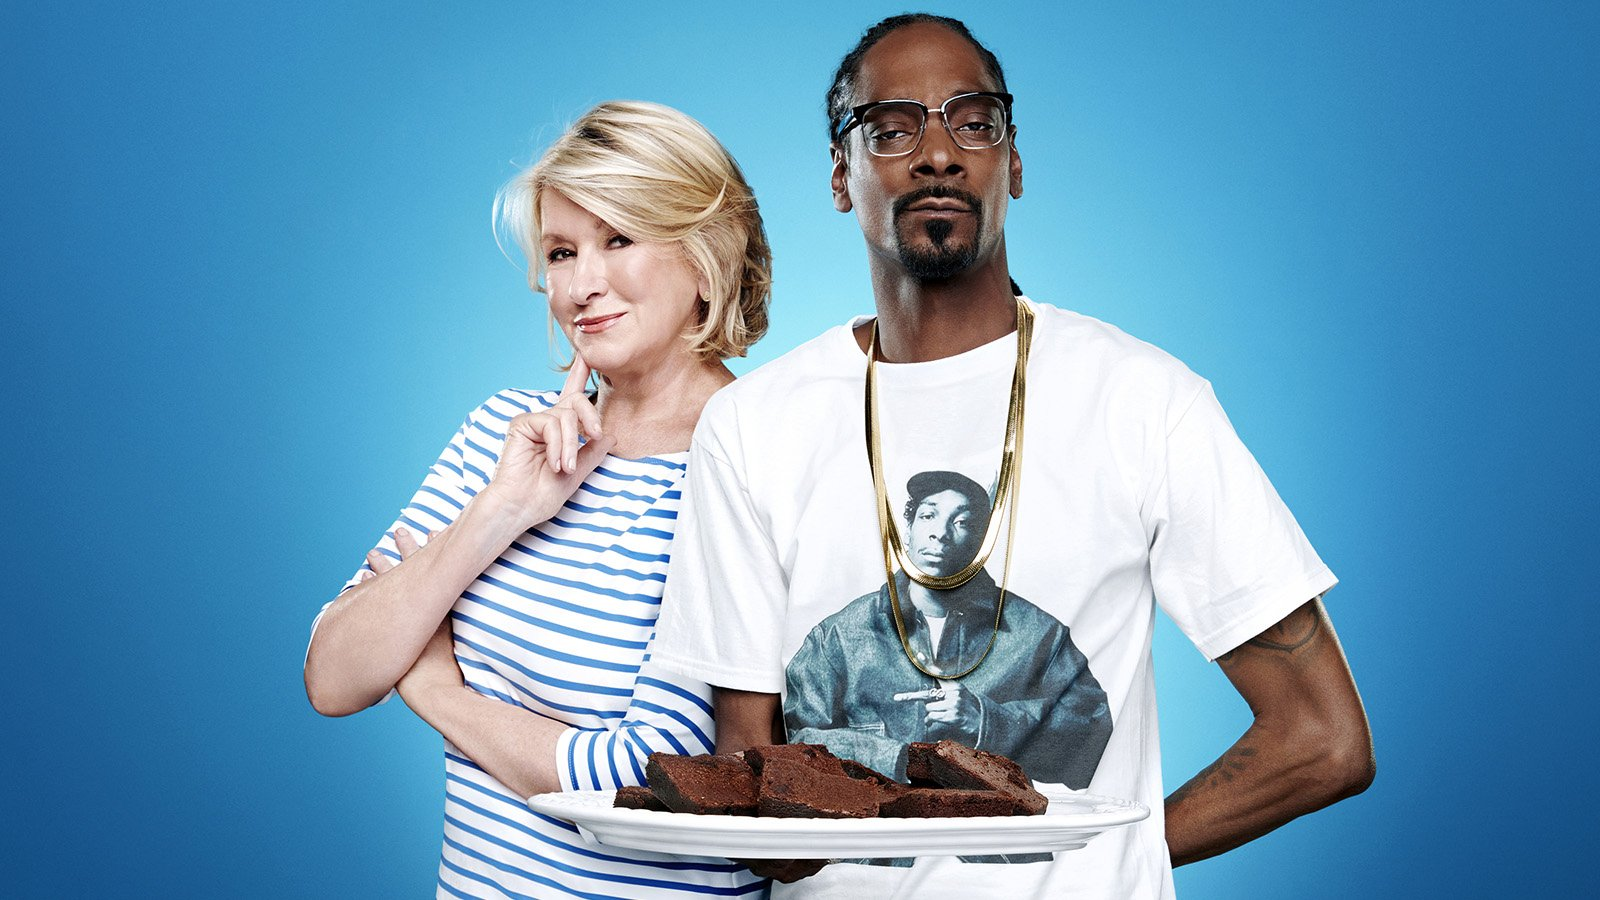 Artwork for 'Martha & Snoop's Potluck Dinner'